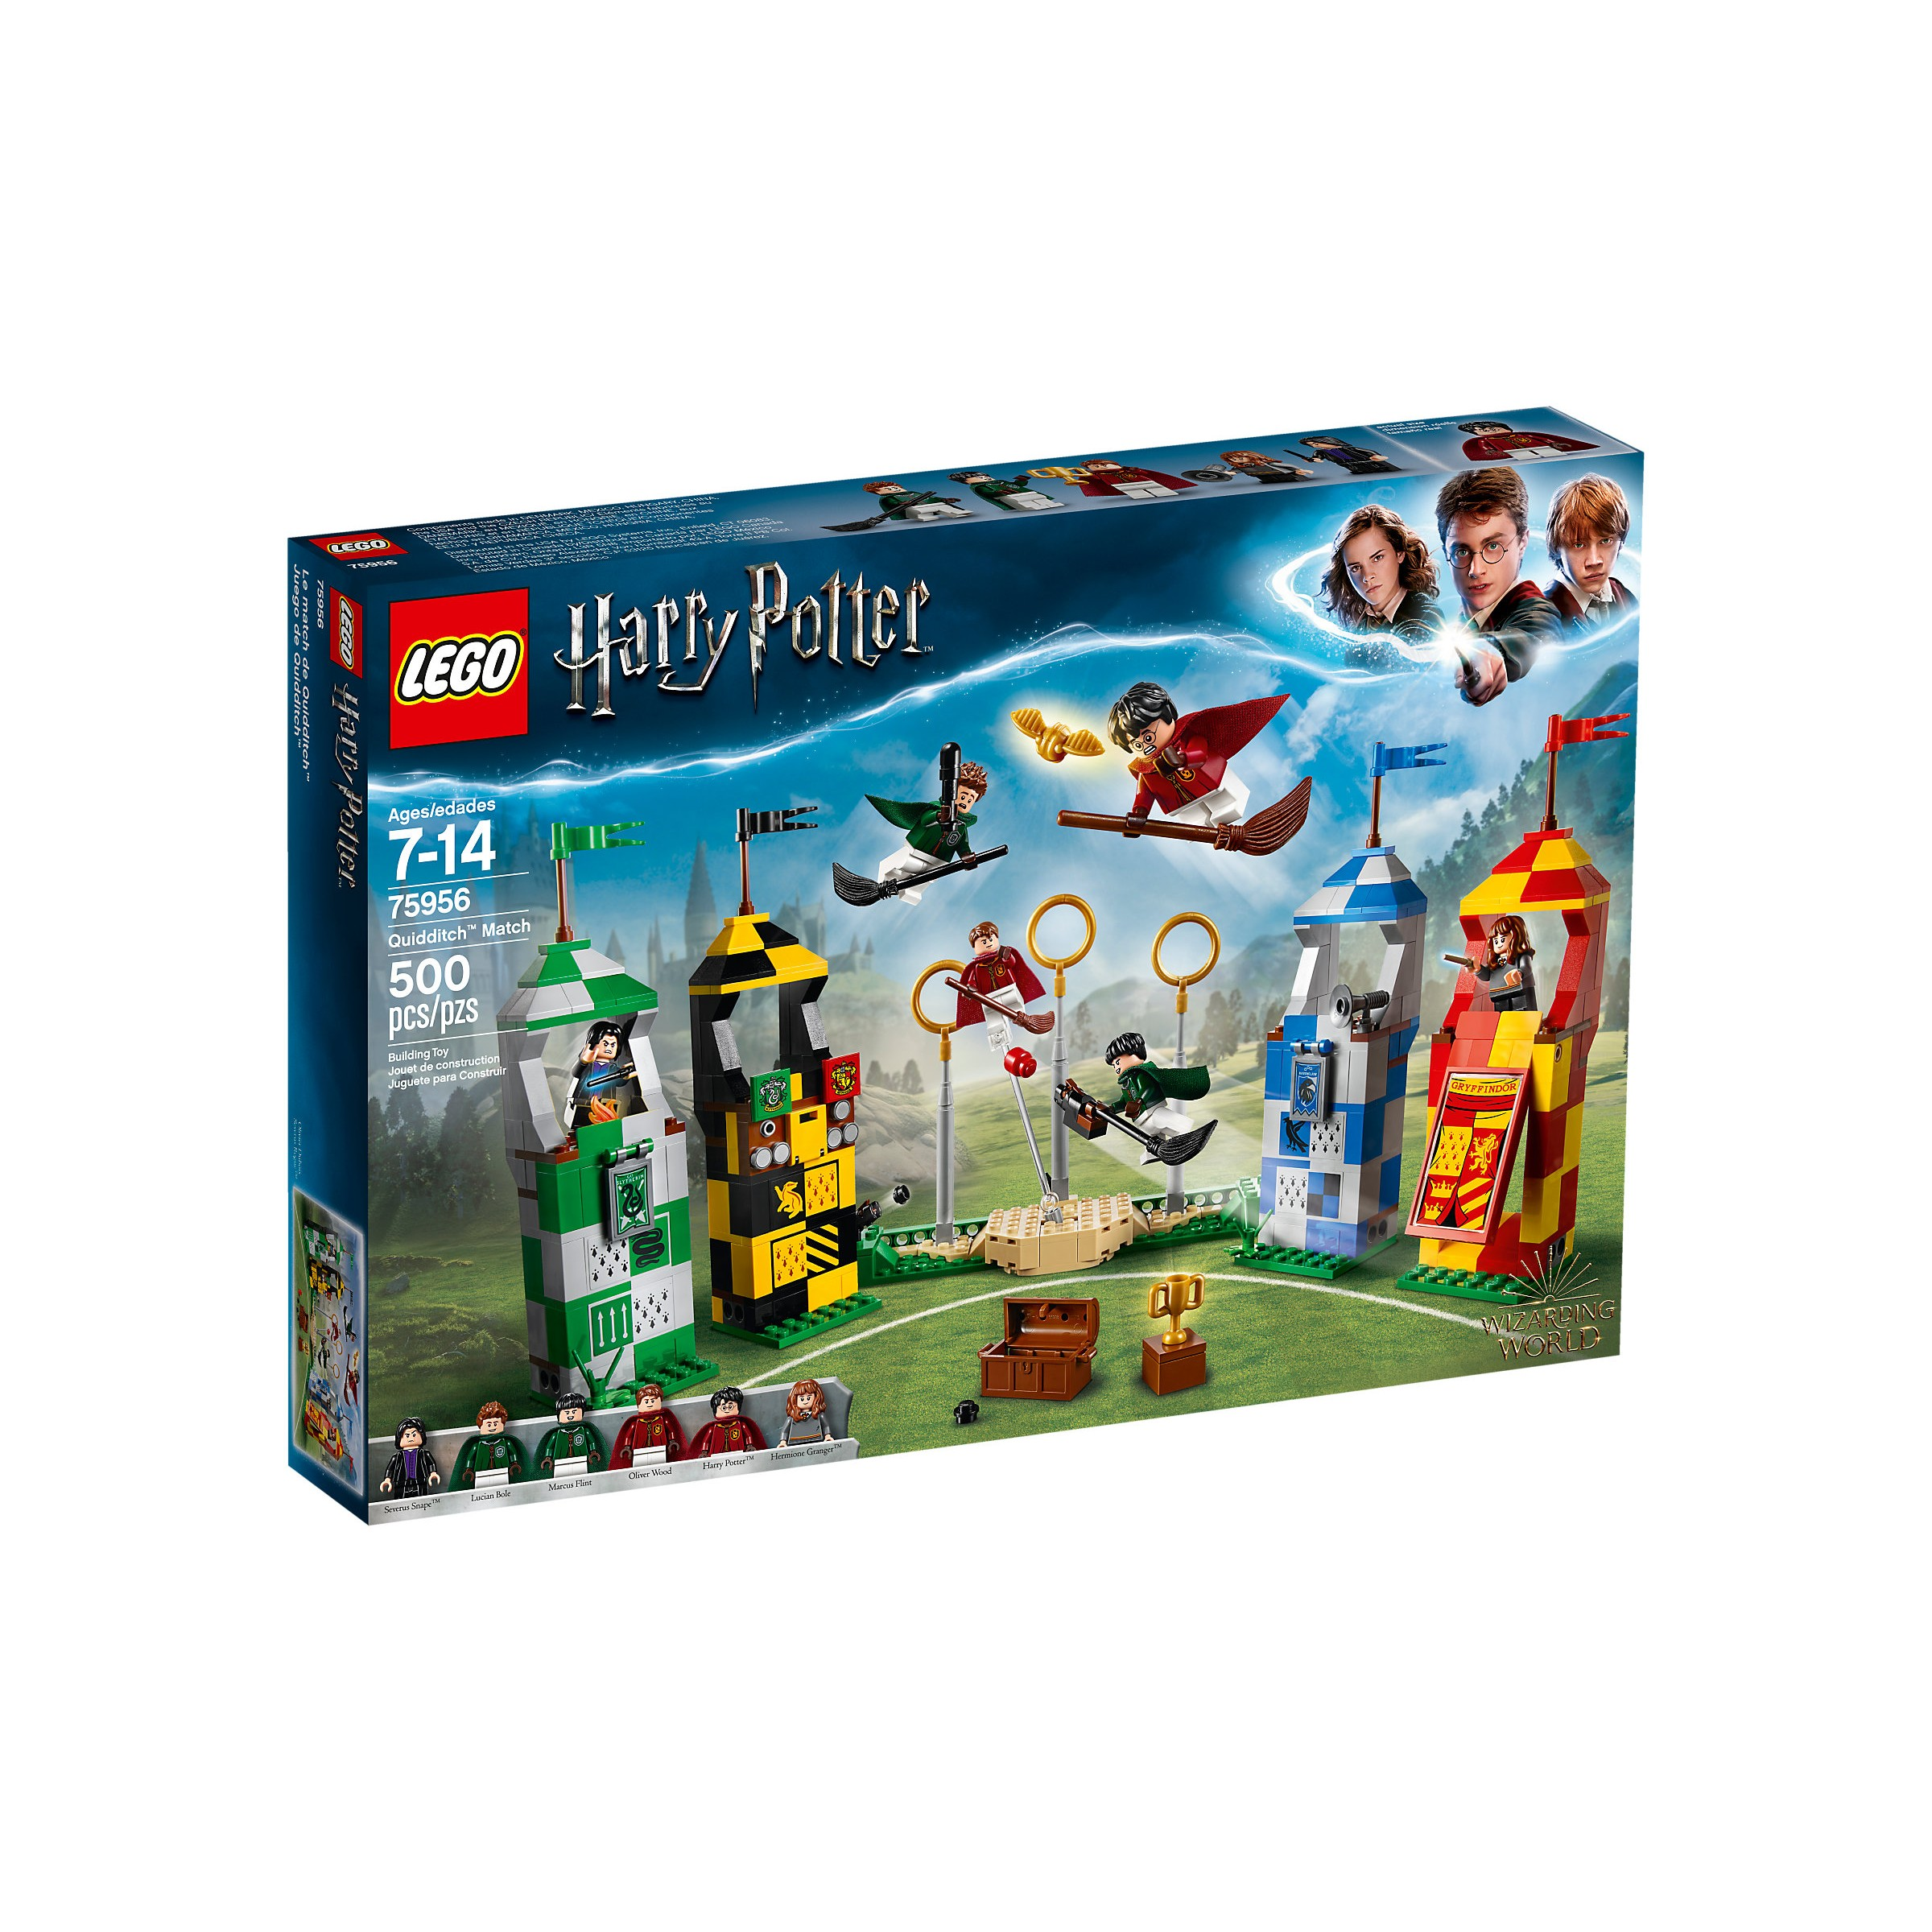 LEGO Microfigures Hogwarts Gryffindor House Player game minifig FREE POST